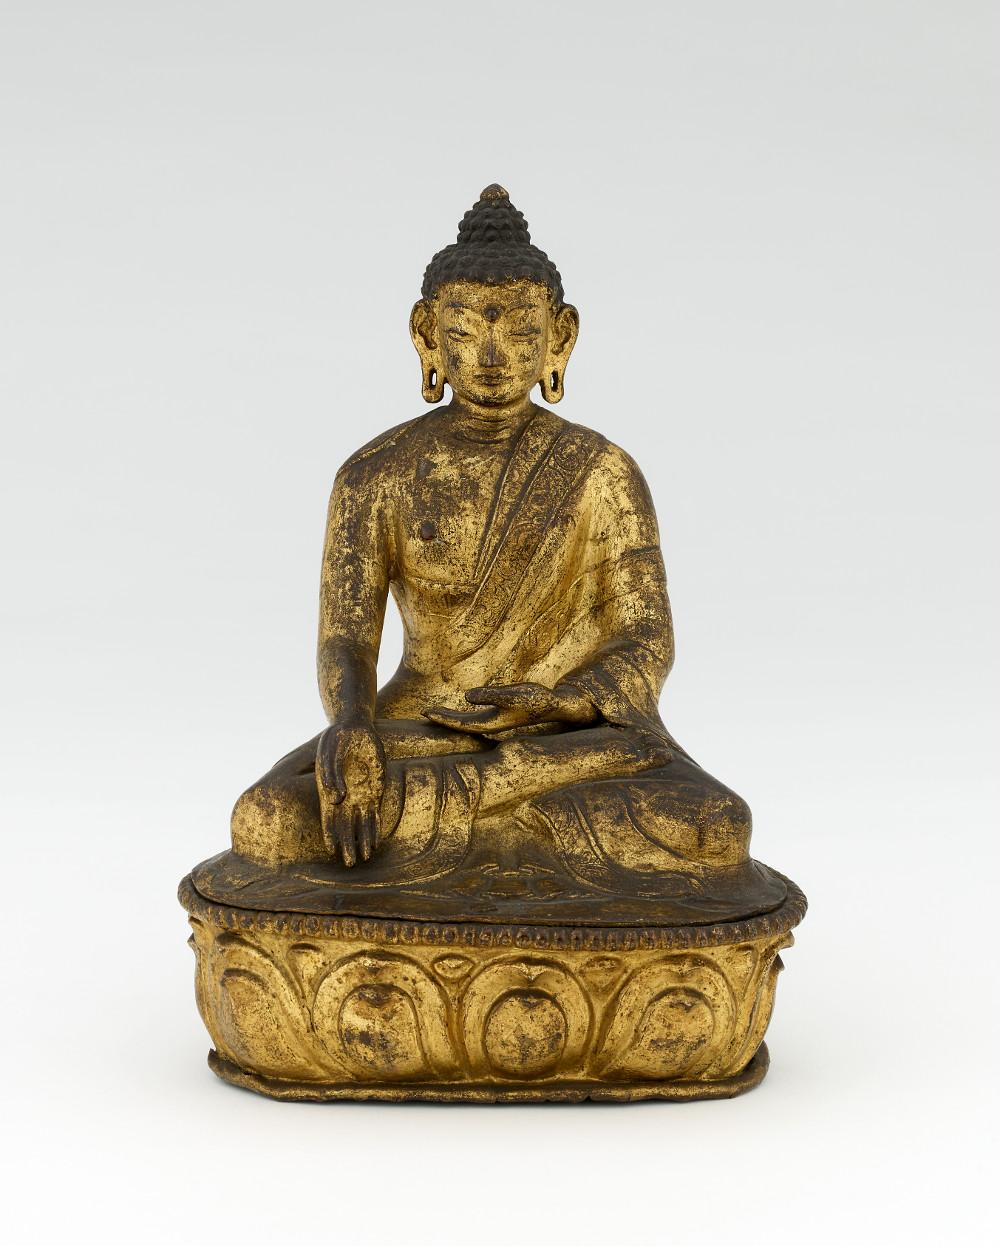 Buddha - Copper alloyAD 1500–1700TibetBritish Museum